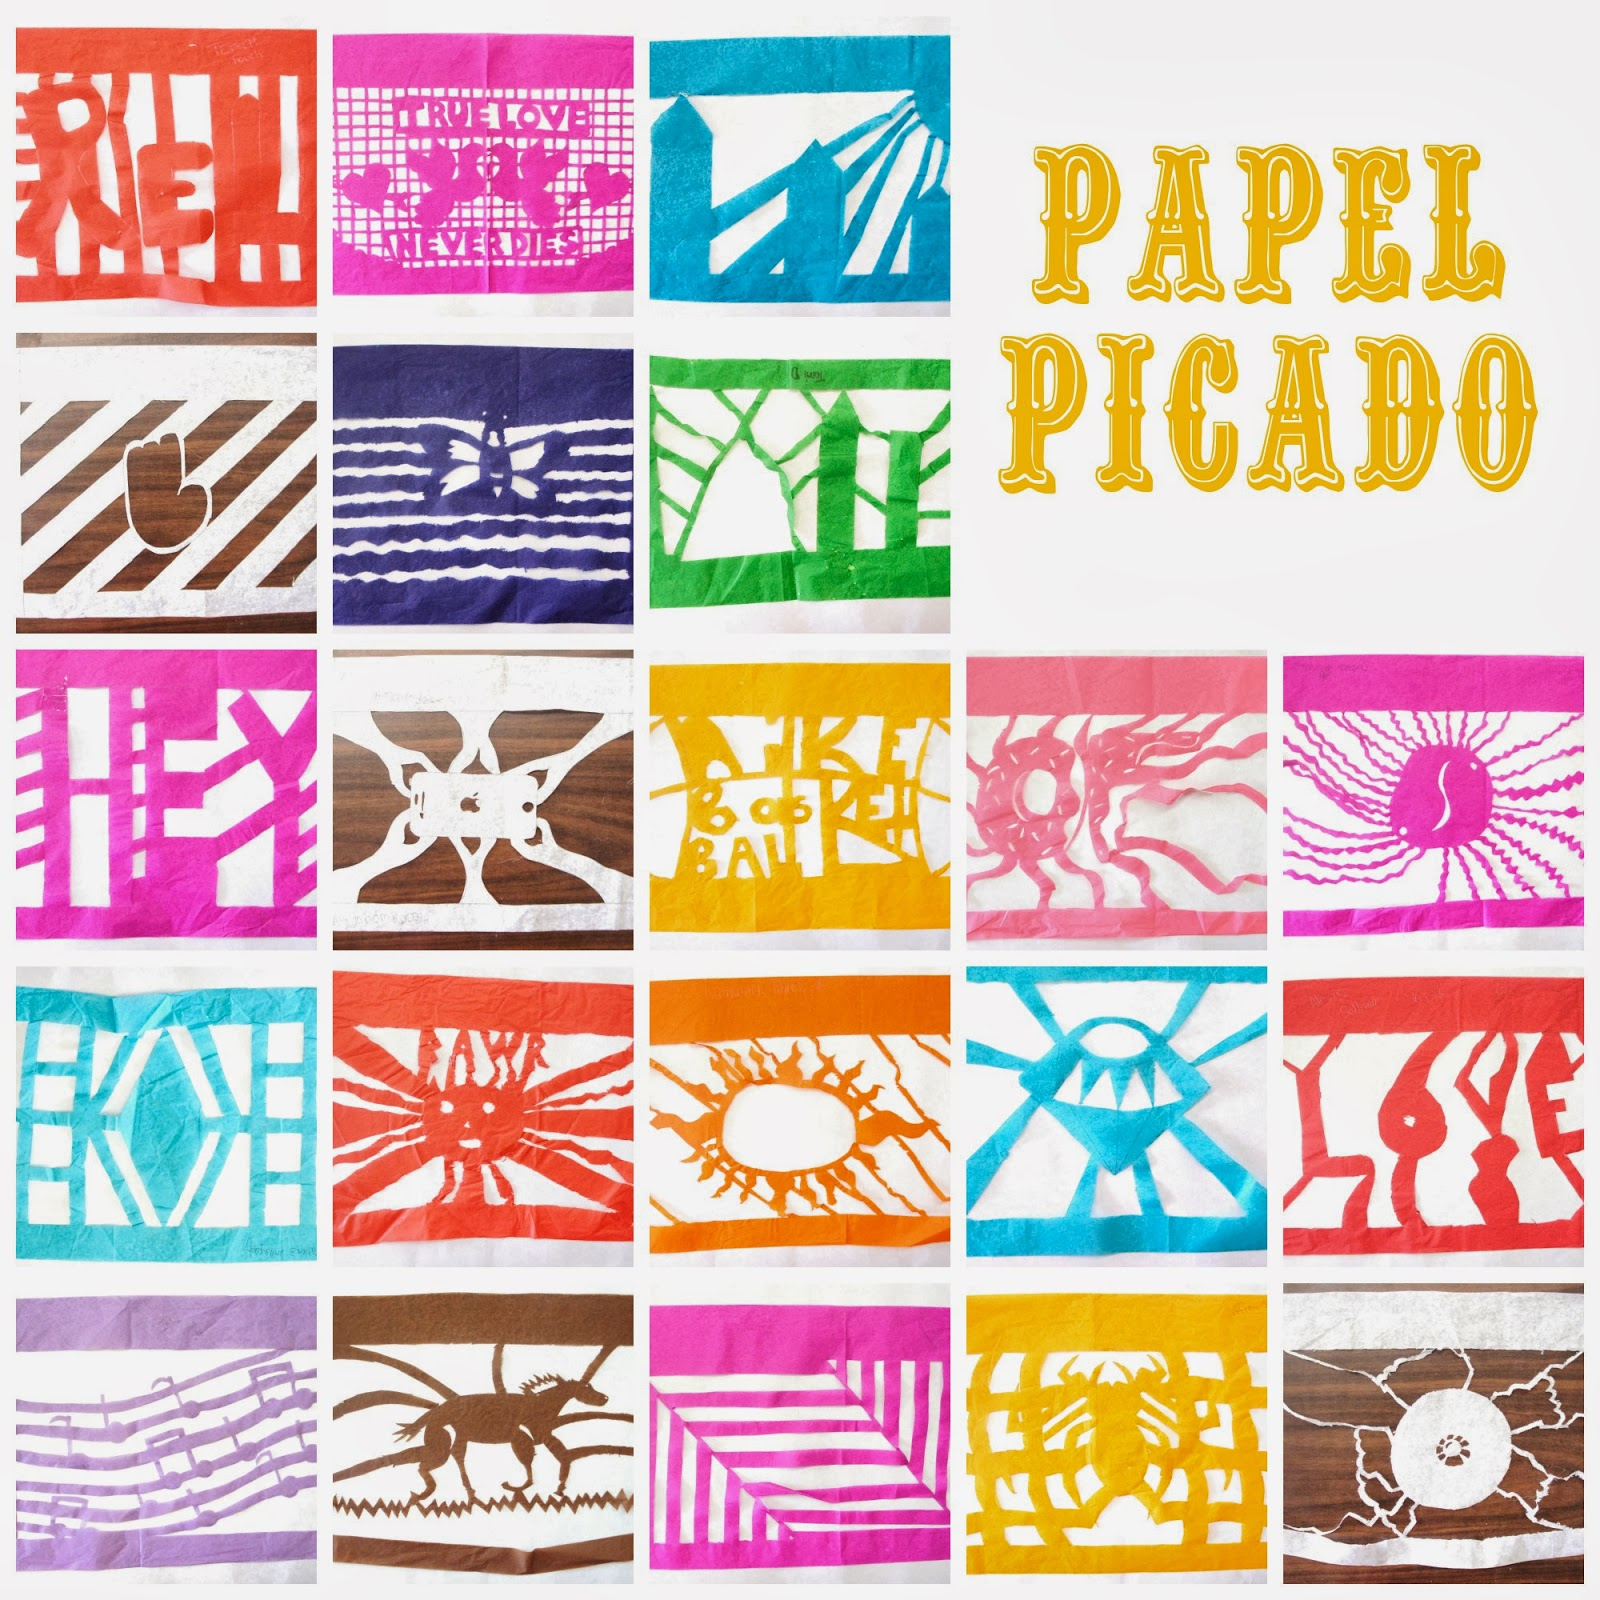 papel picado designs template - photo #20